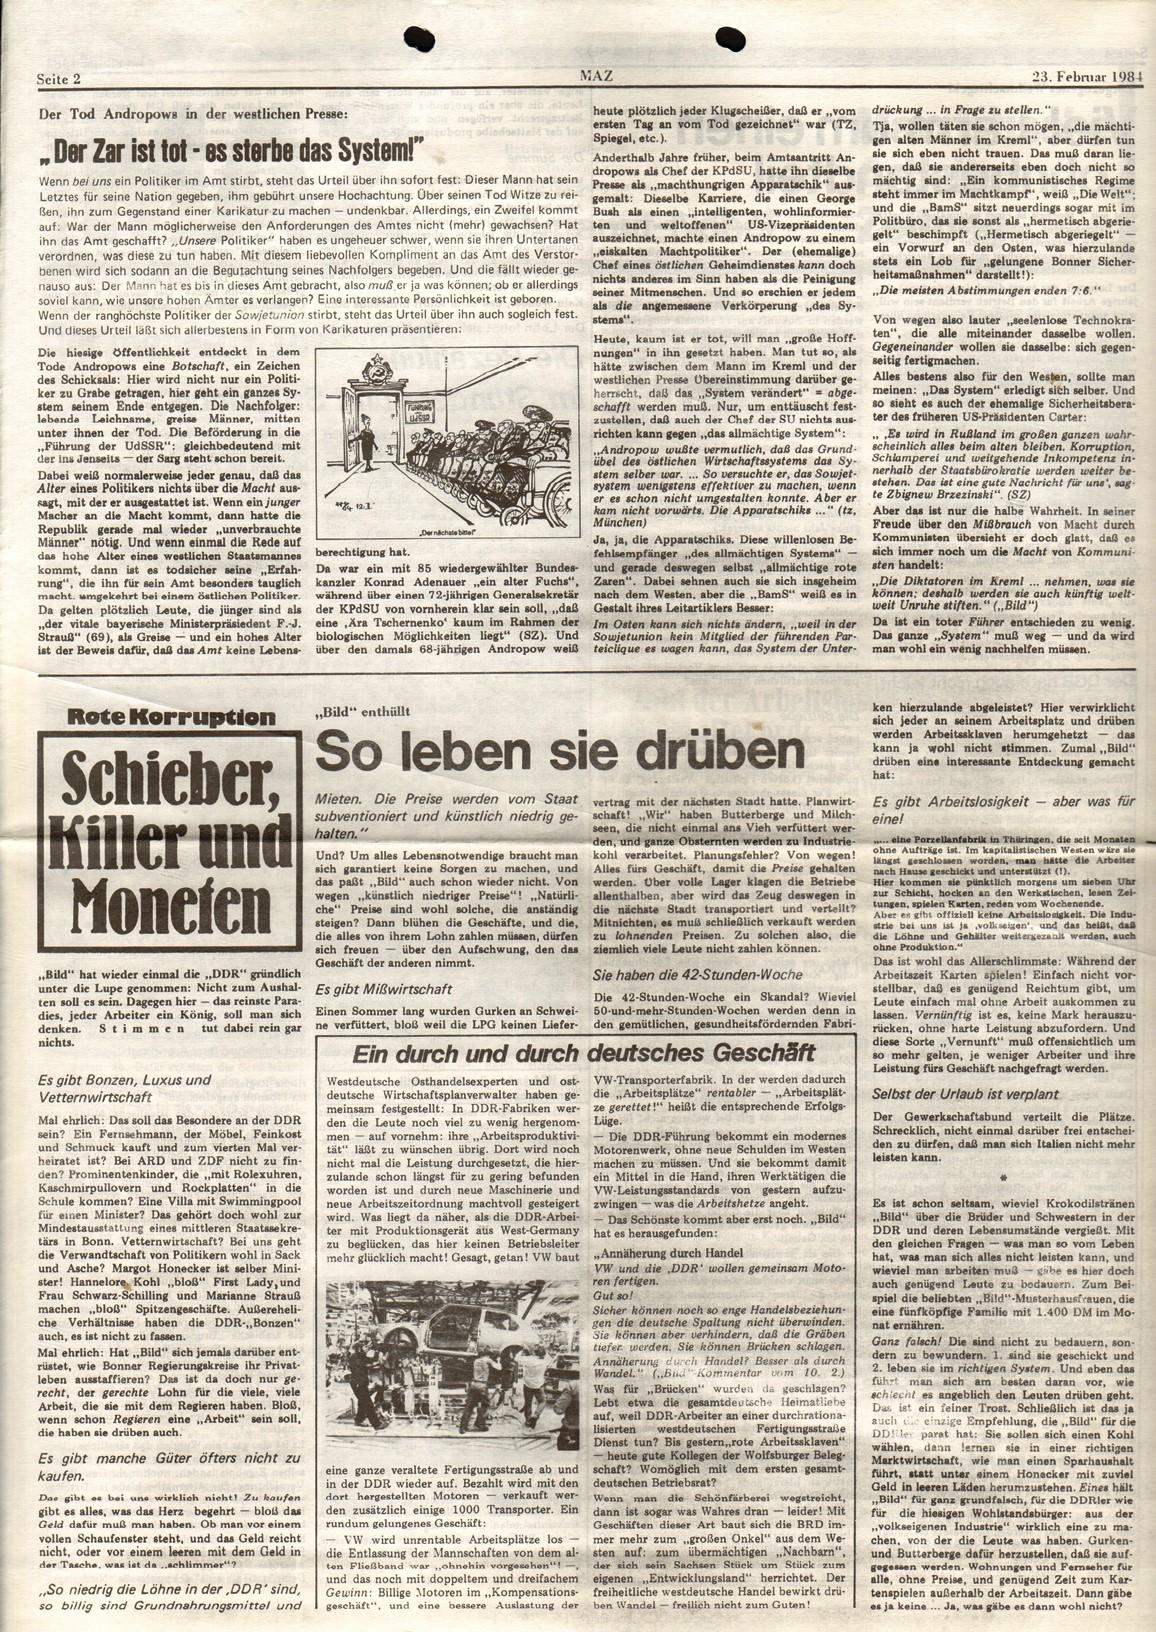 Fuerth_MG_MAZ_Dynamit_Nobel_19840223_02